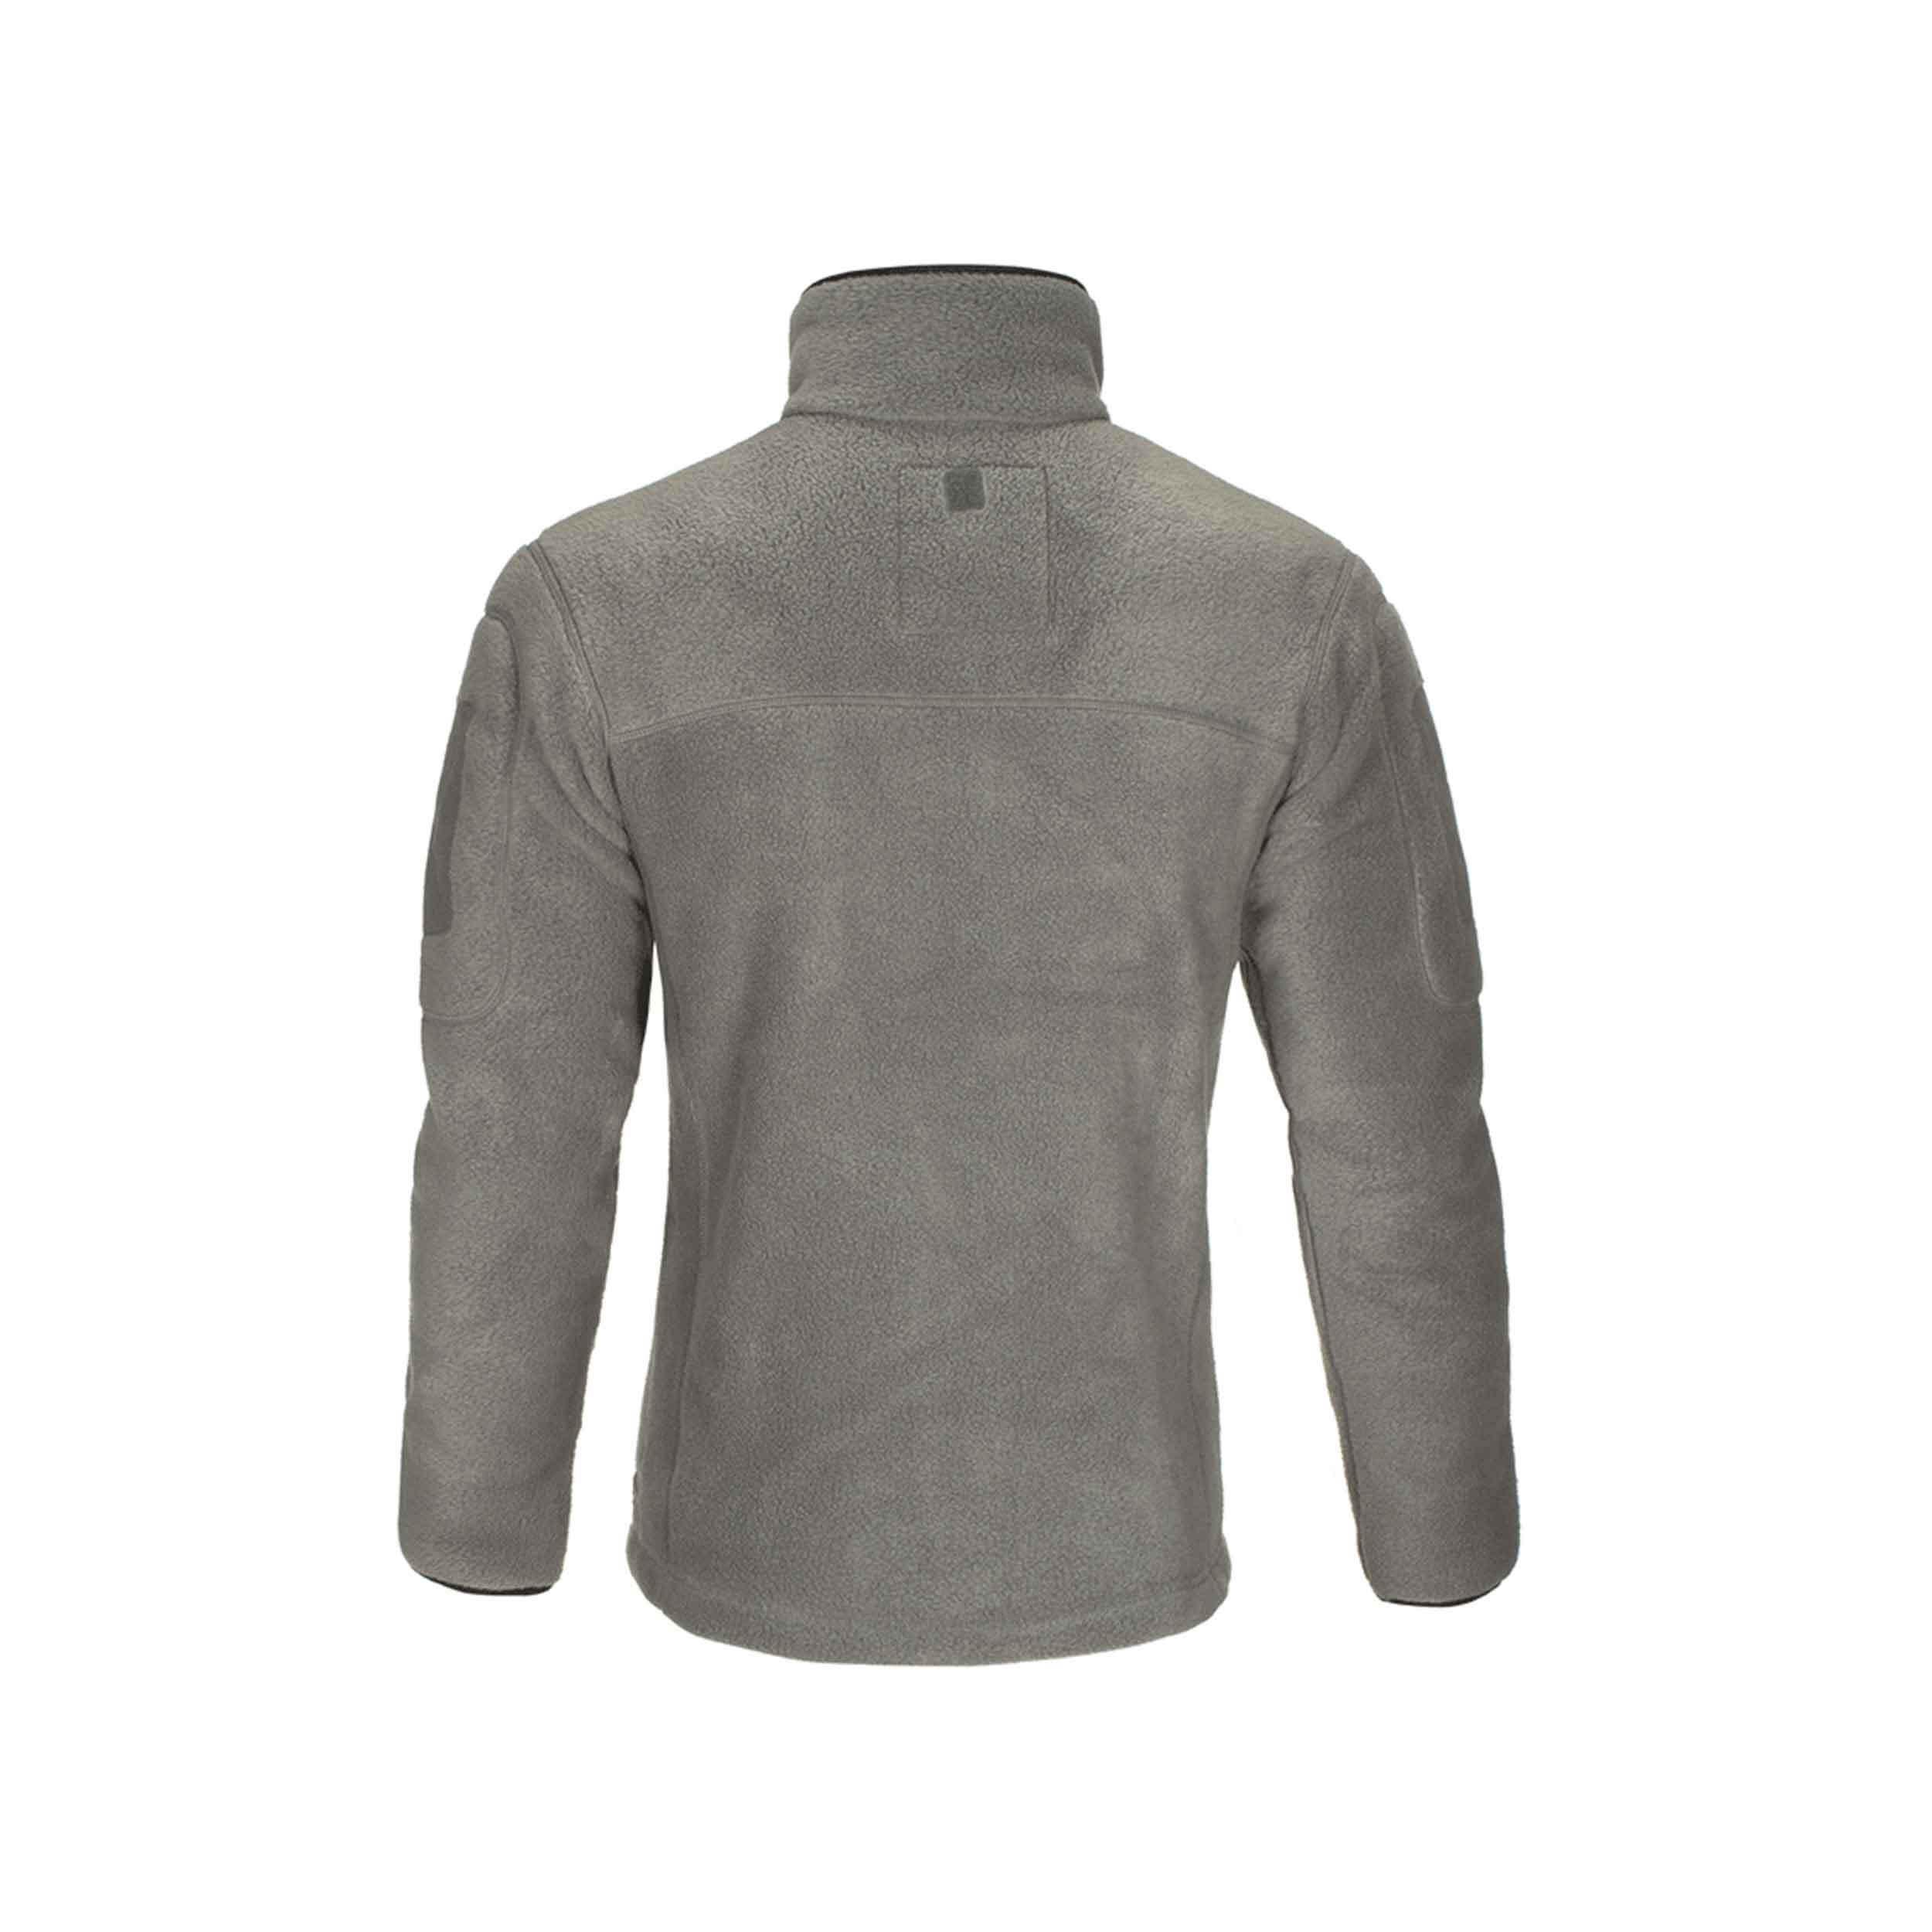 Clawgear Milvago Fleece Jacke Solid Rock